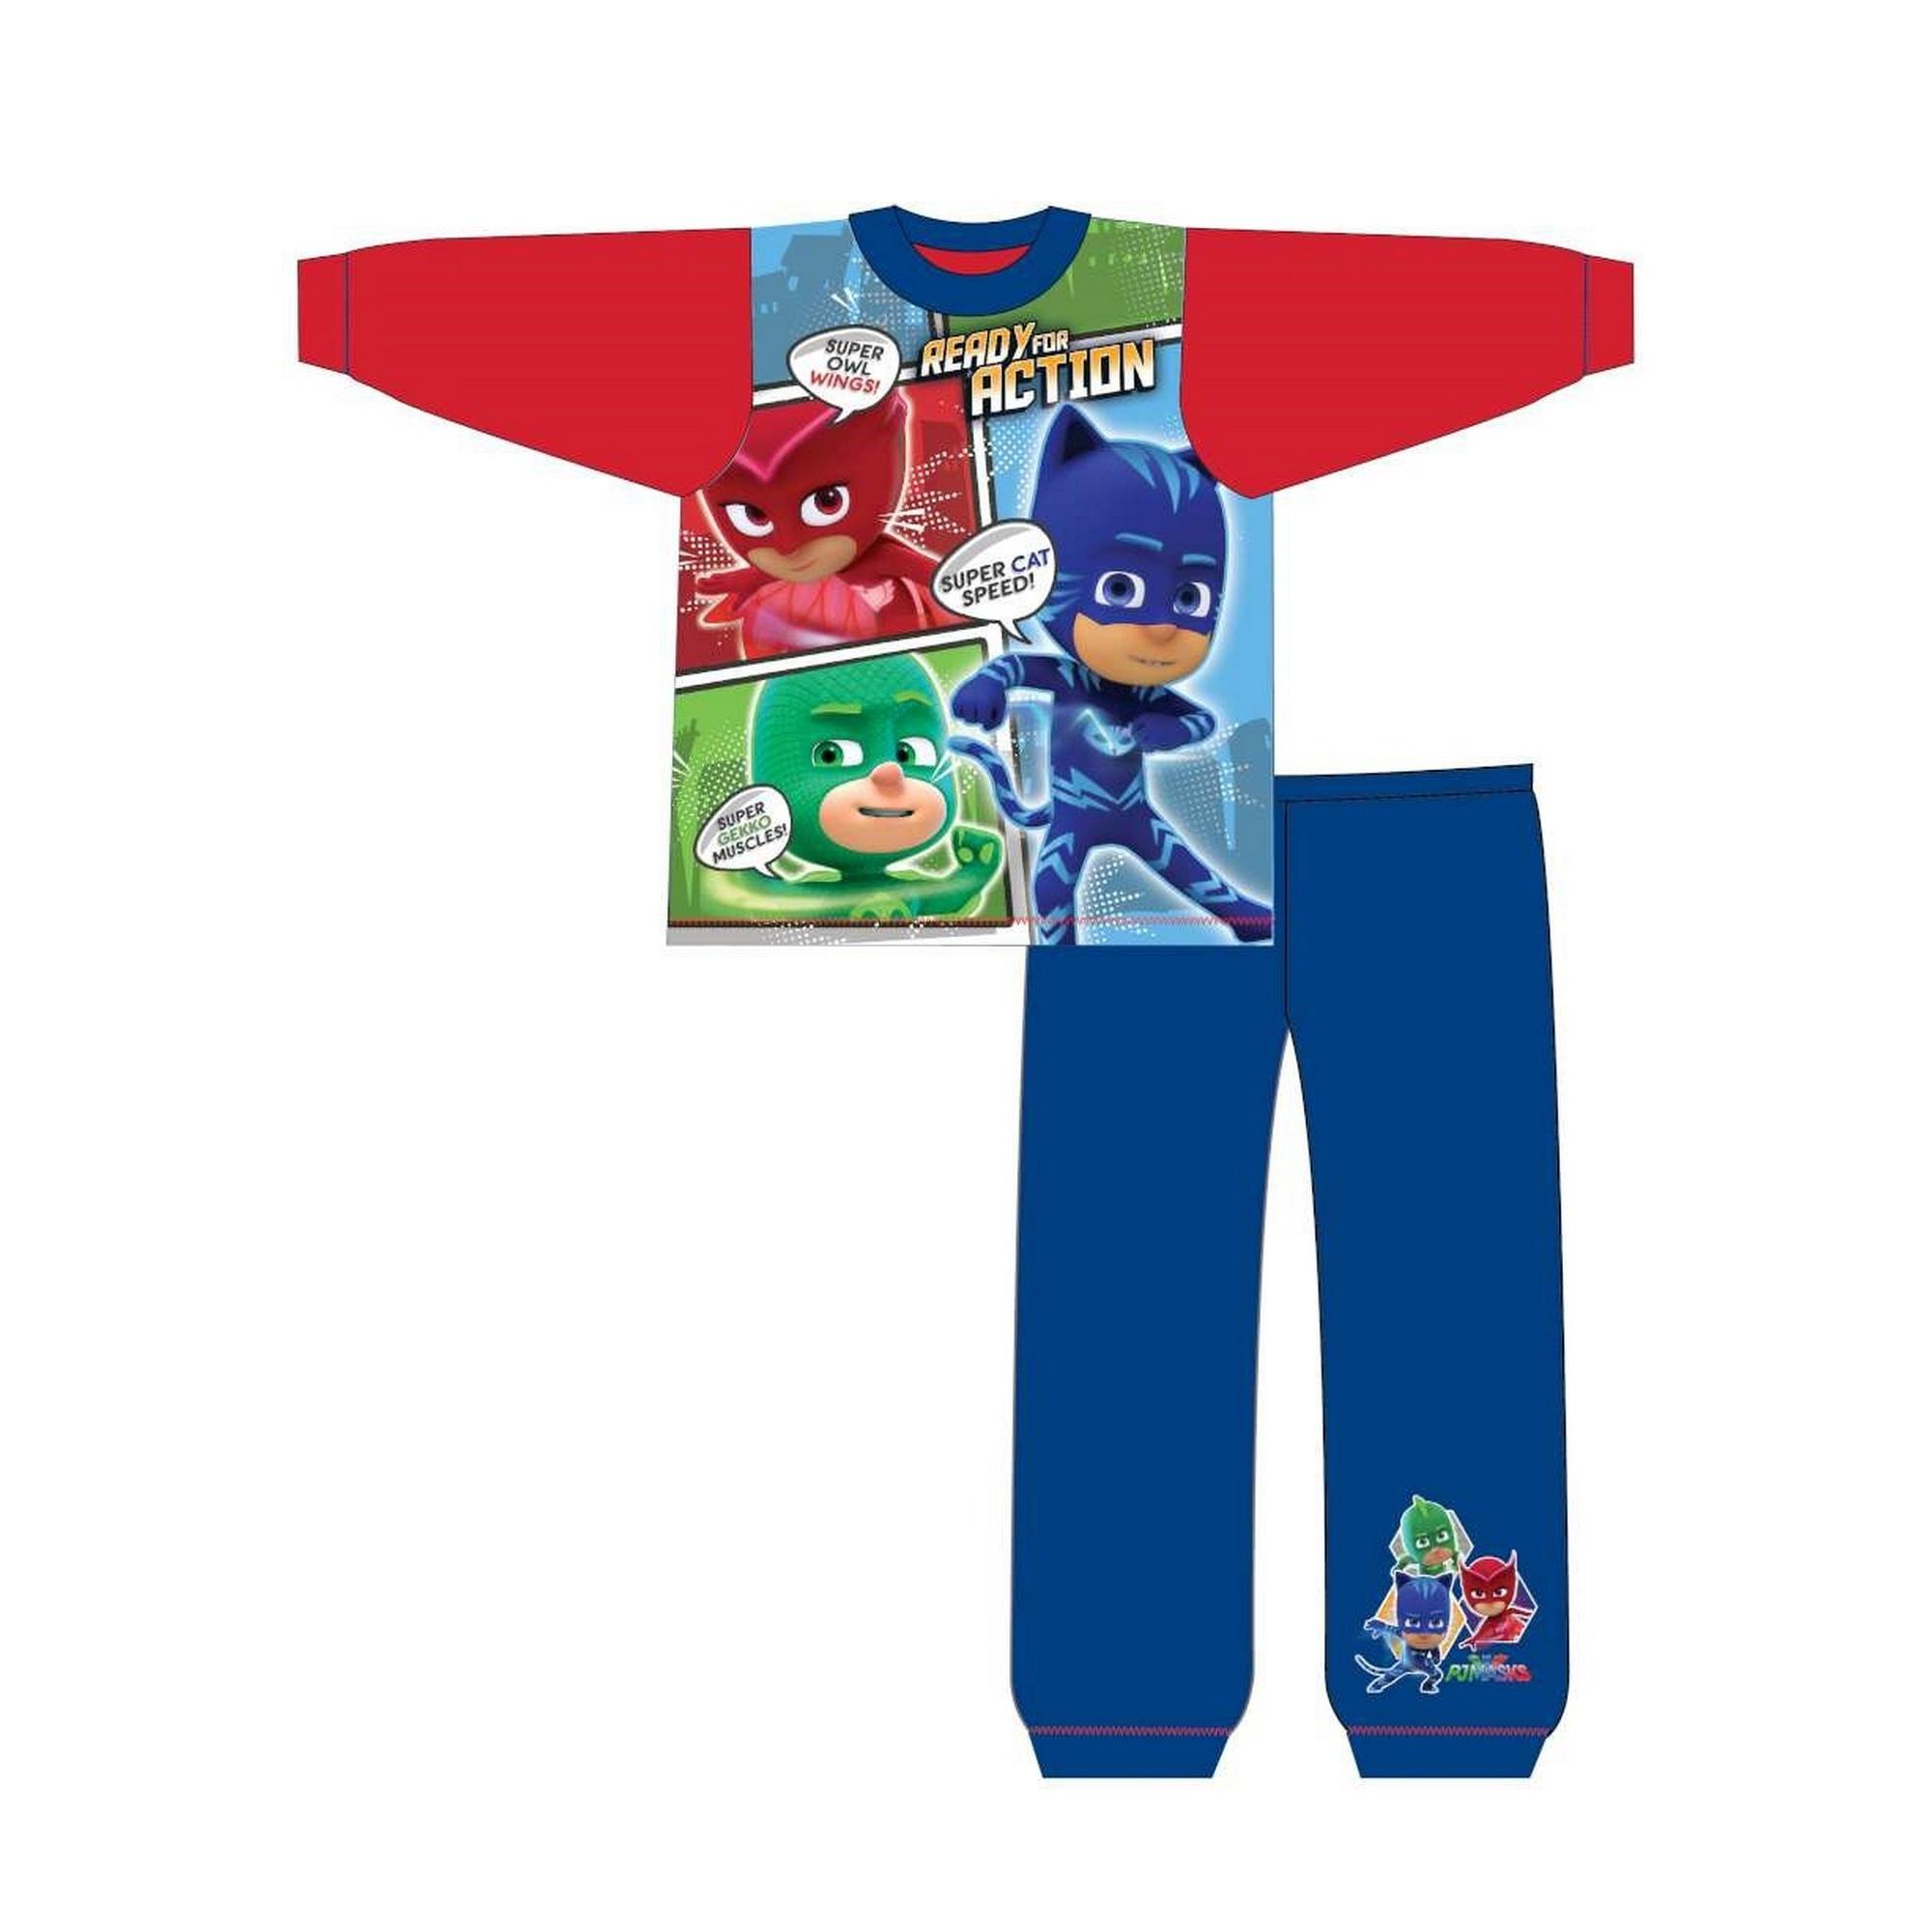 PJ-Masks-Pijama-largo-infantil-con-ilustracion-y-texto-Ready-For-TF580